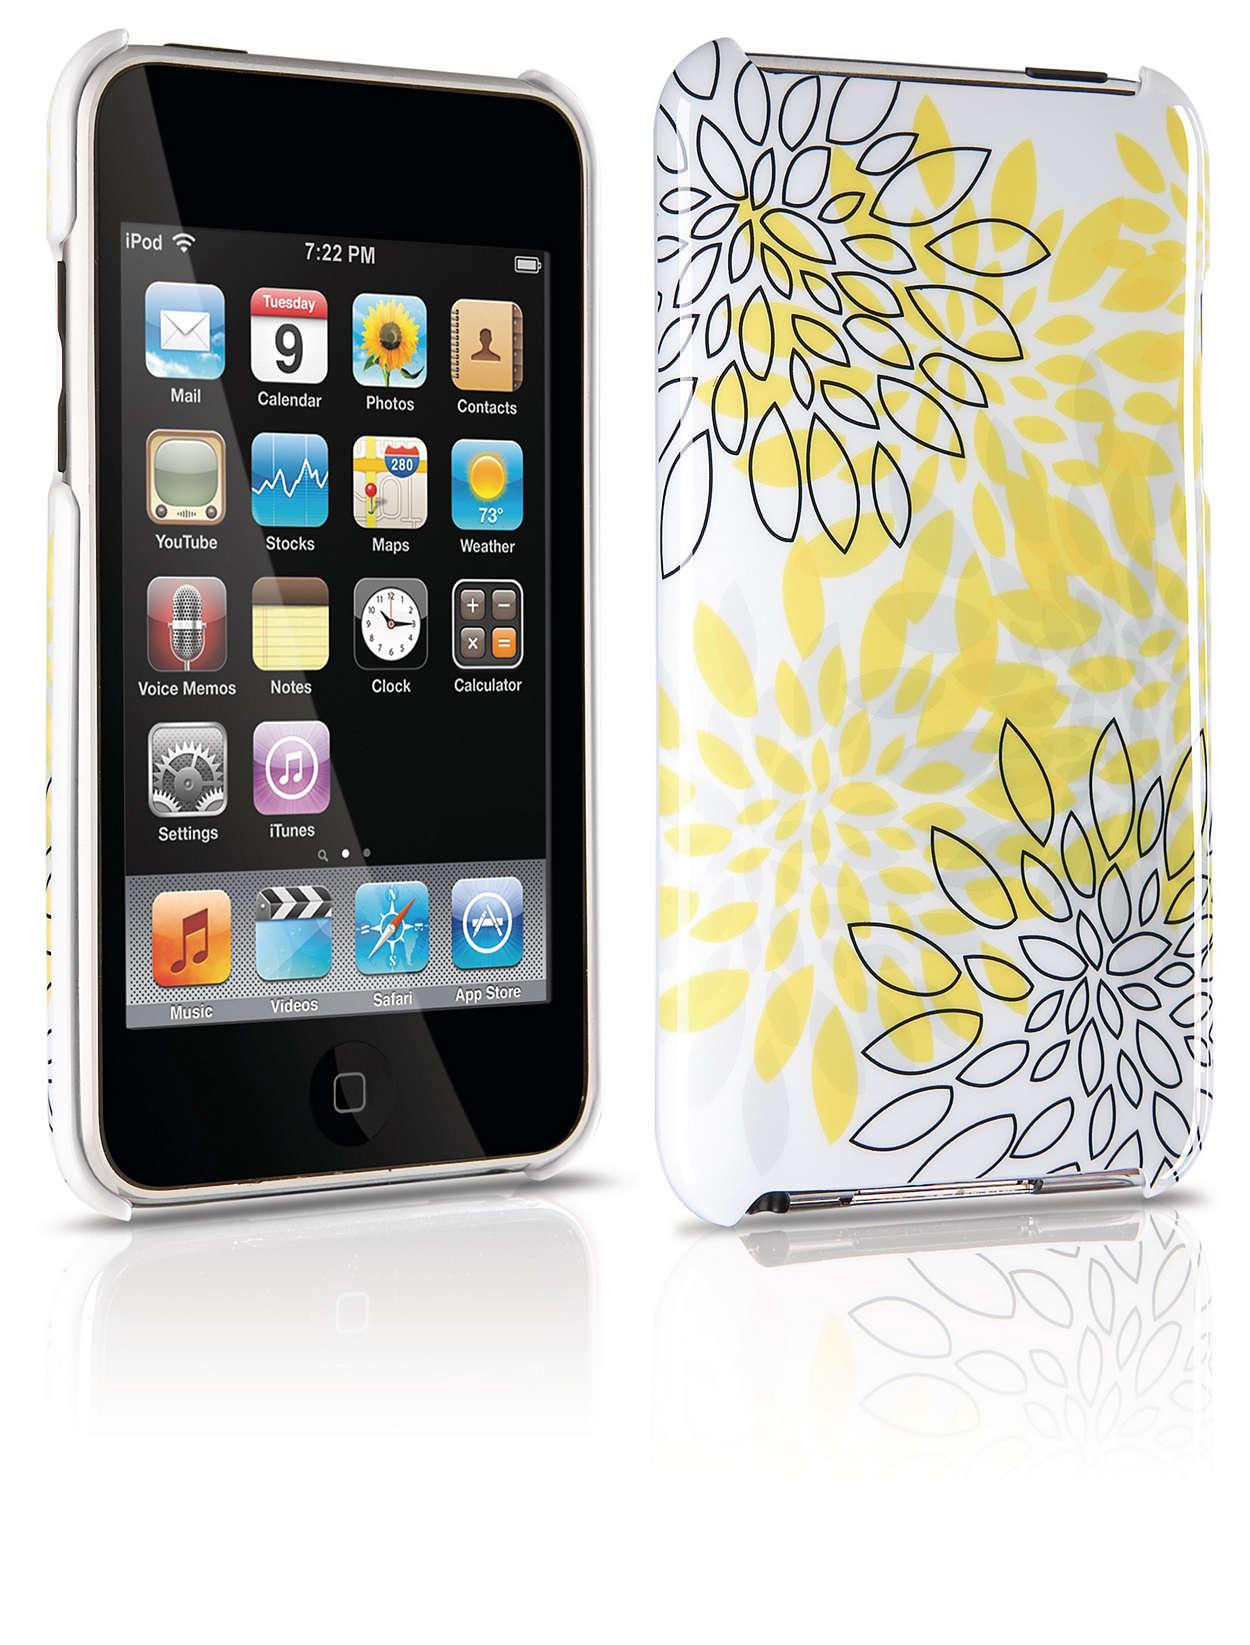 Protege a tu iPod con una funda rígida